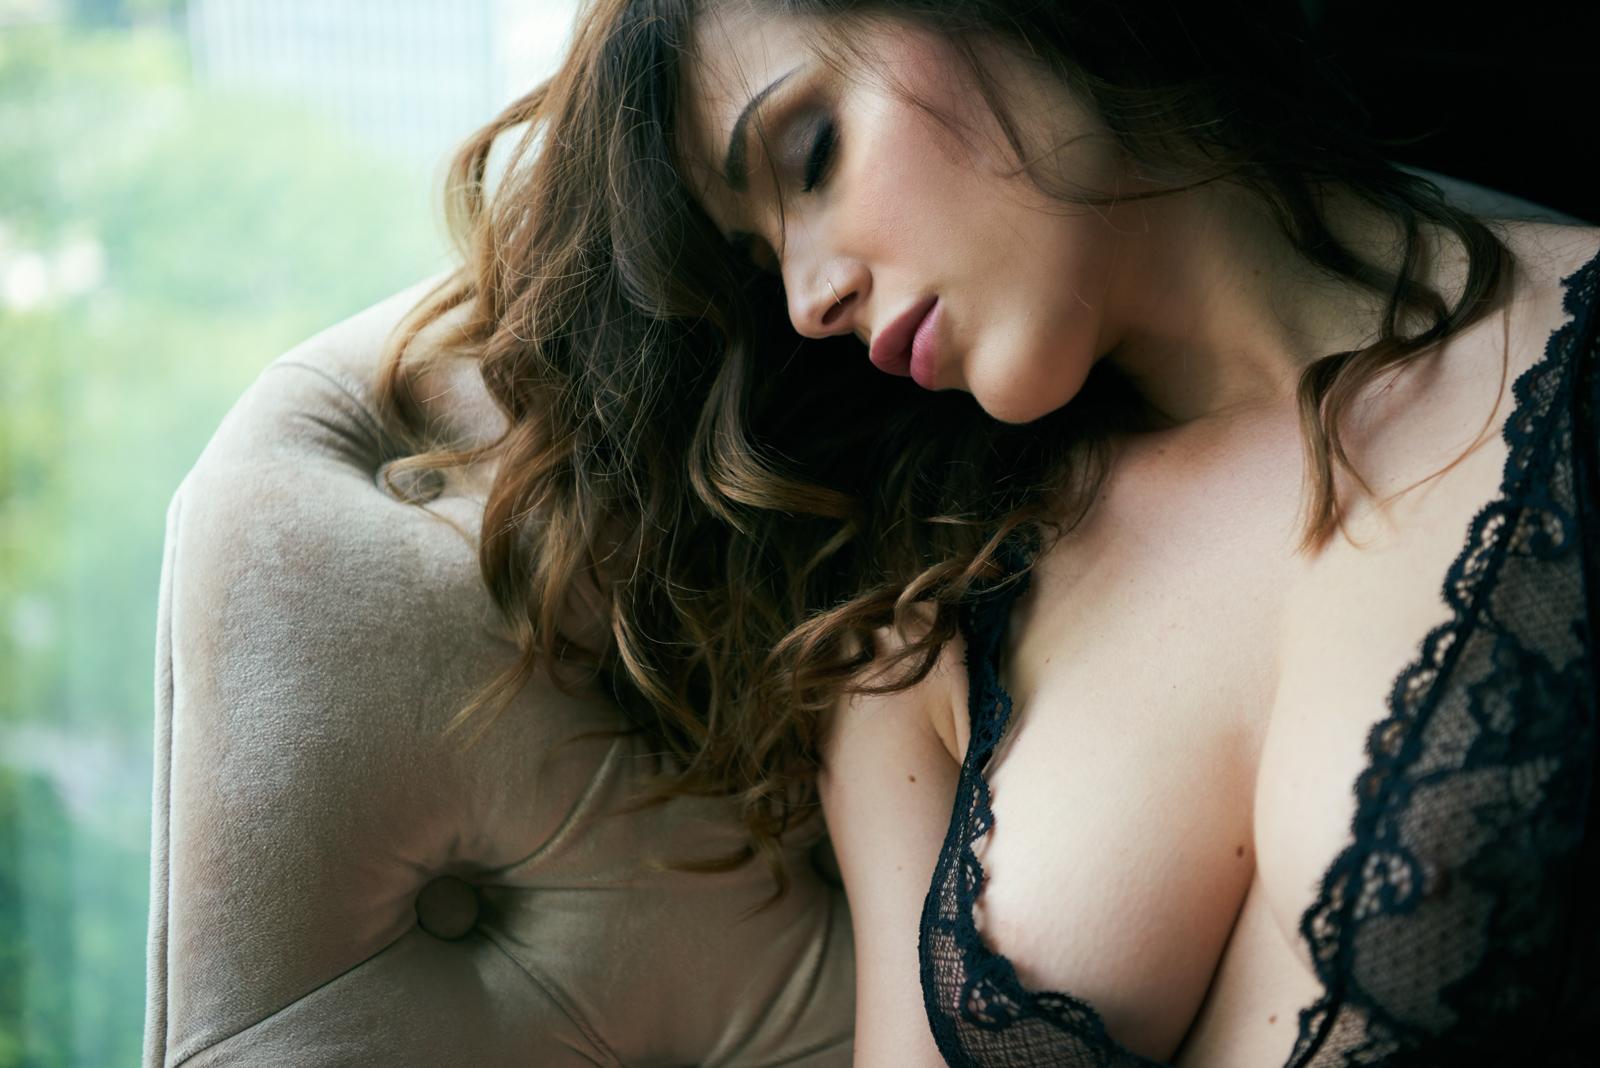 Nicole Vincenti by Terence Lee Ji Long